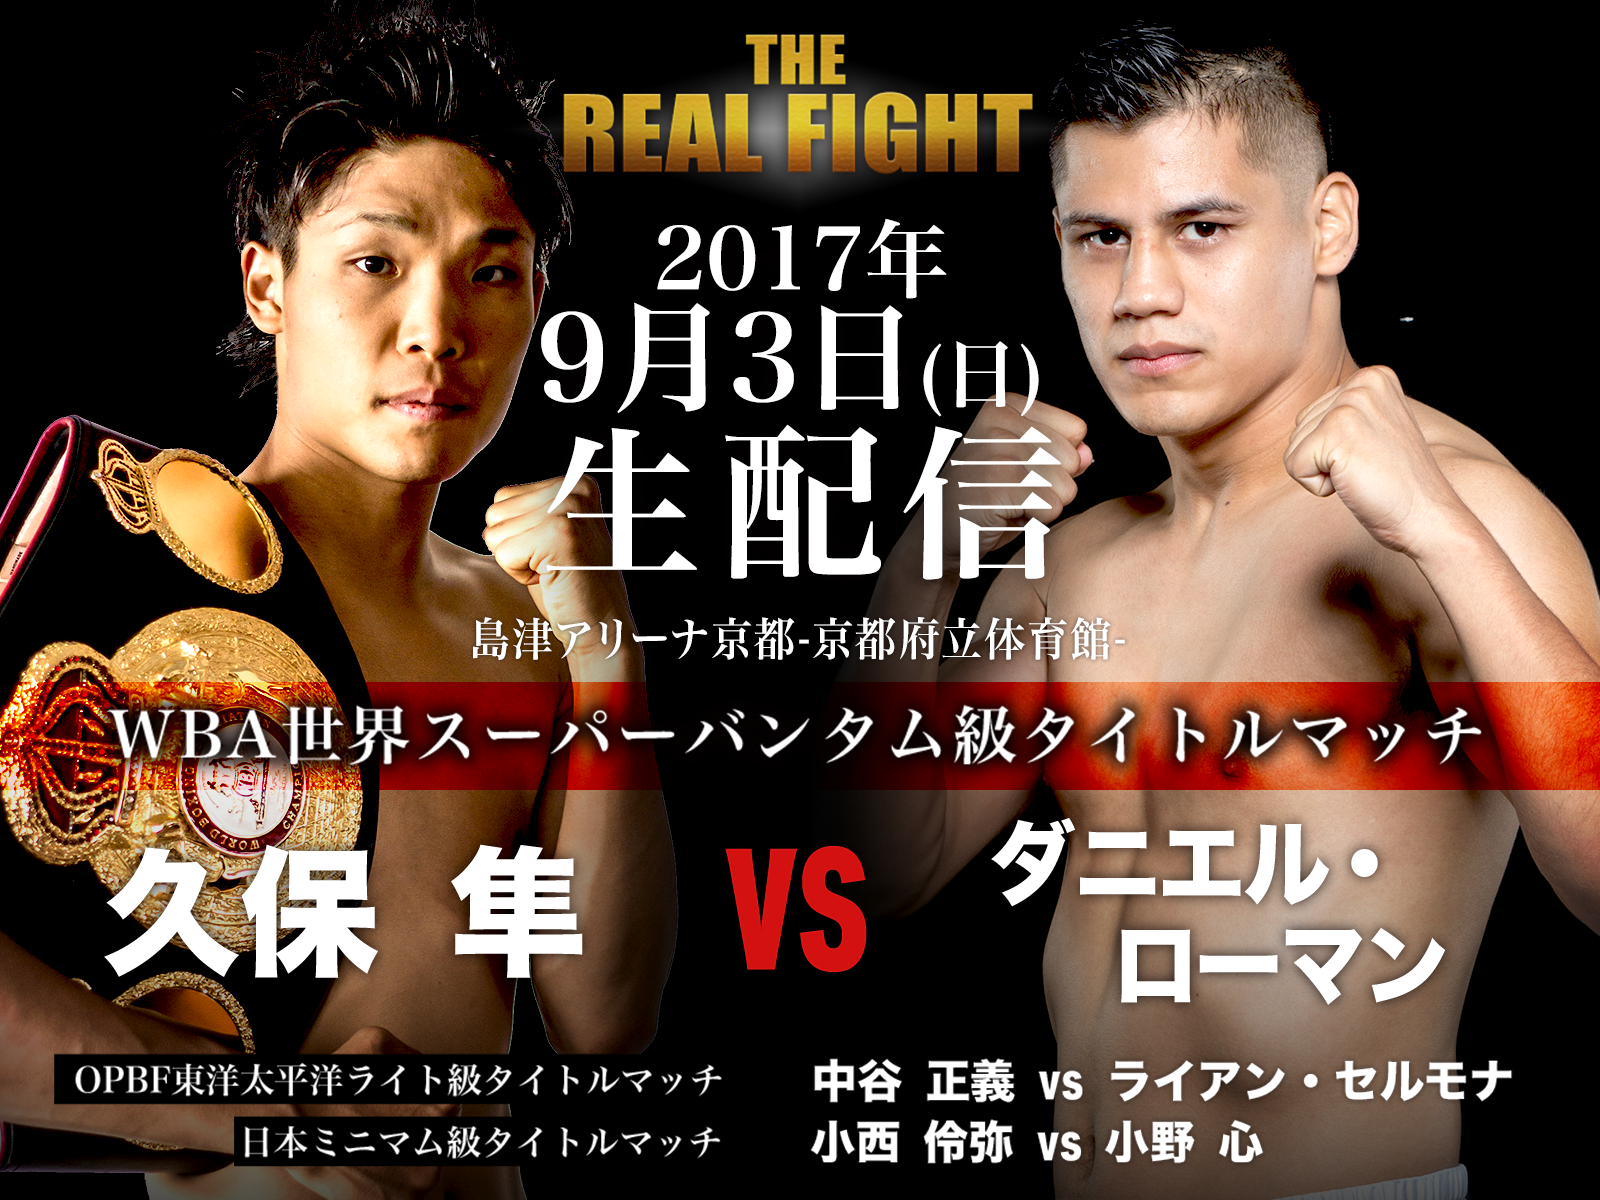 2017/9/3 THE REAL FIGHT[世界] 島津アリーナ京都/【ライブ配信】WBA世界スーパーバンタム級タイトルマッチ